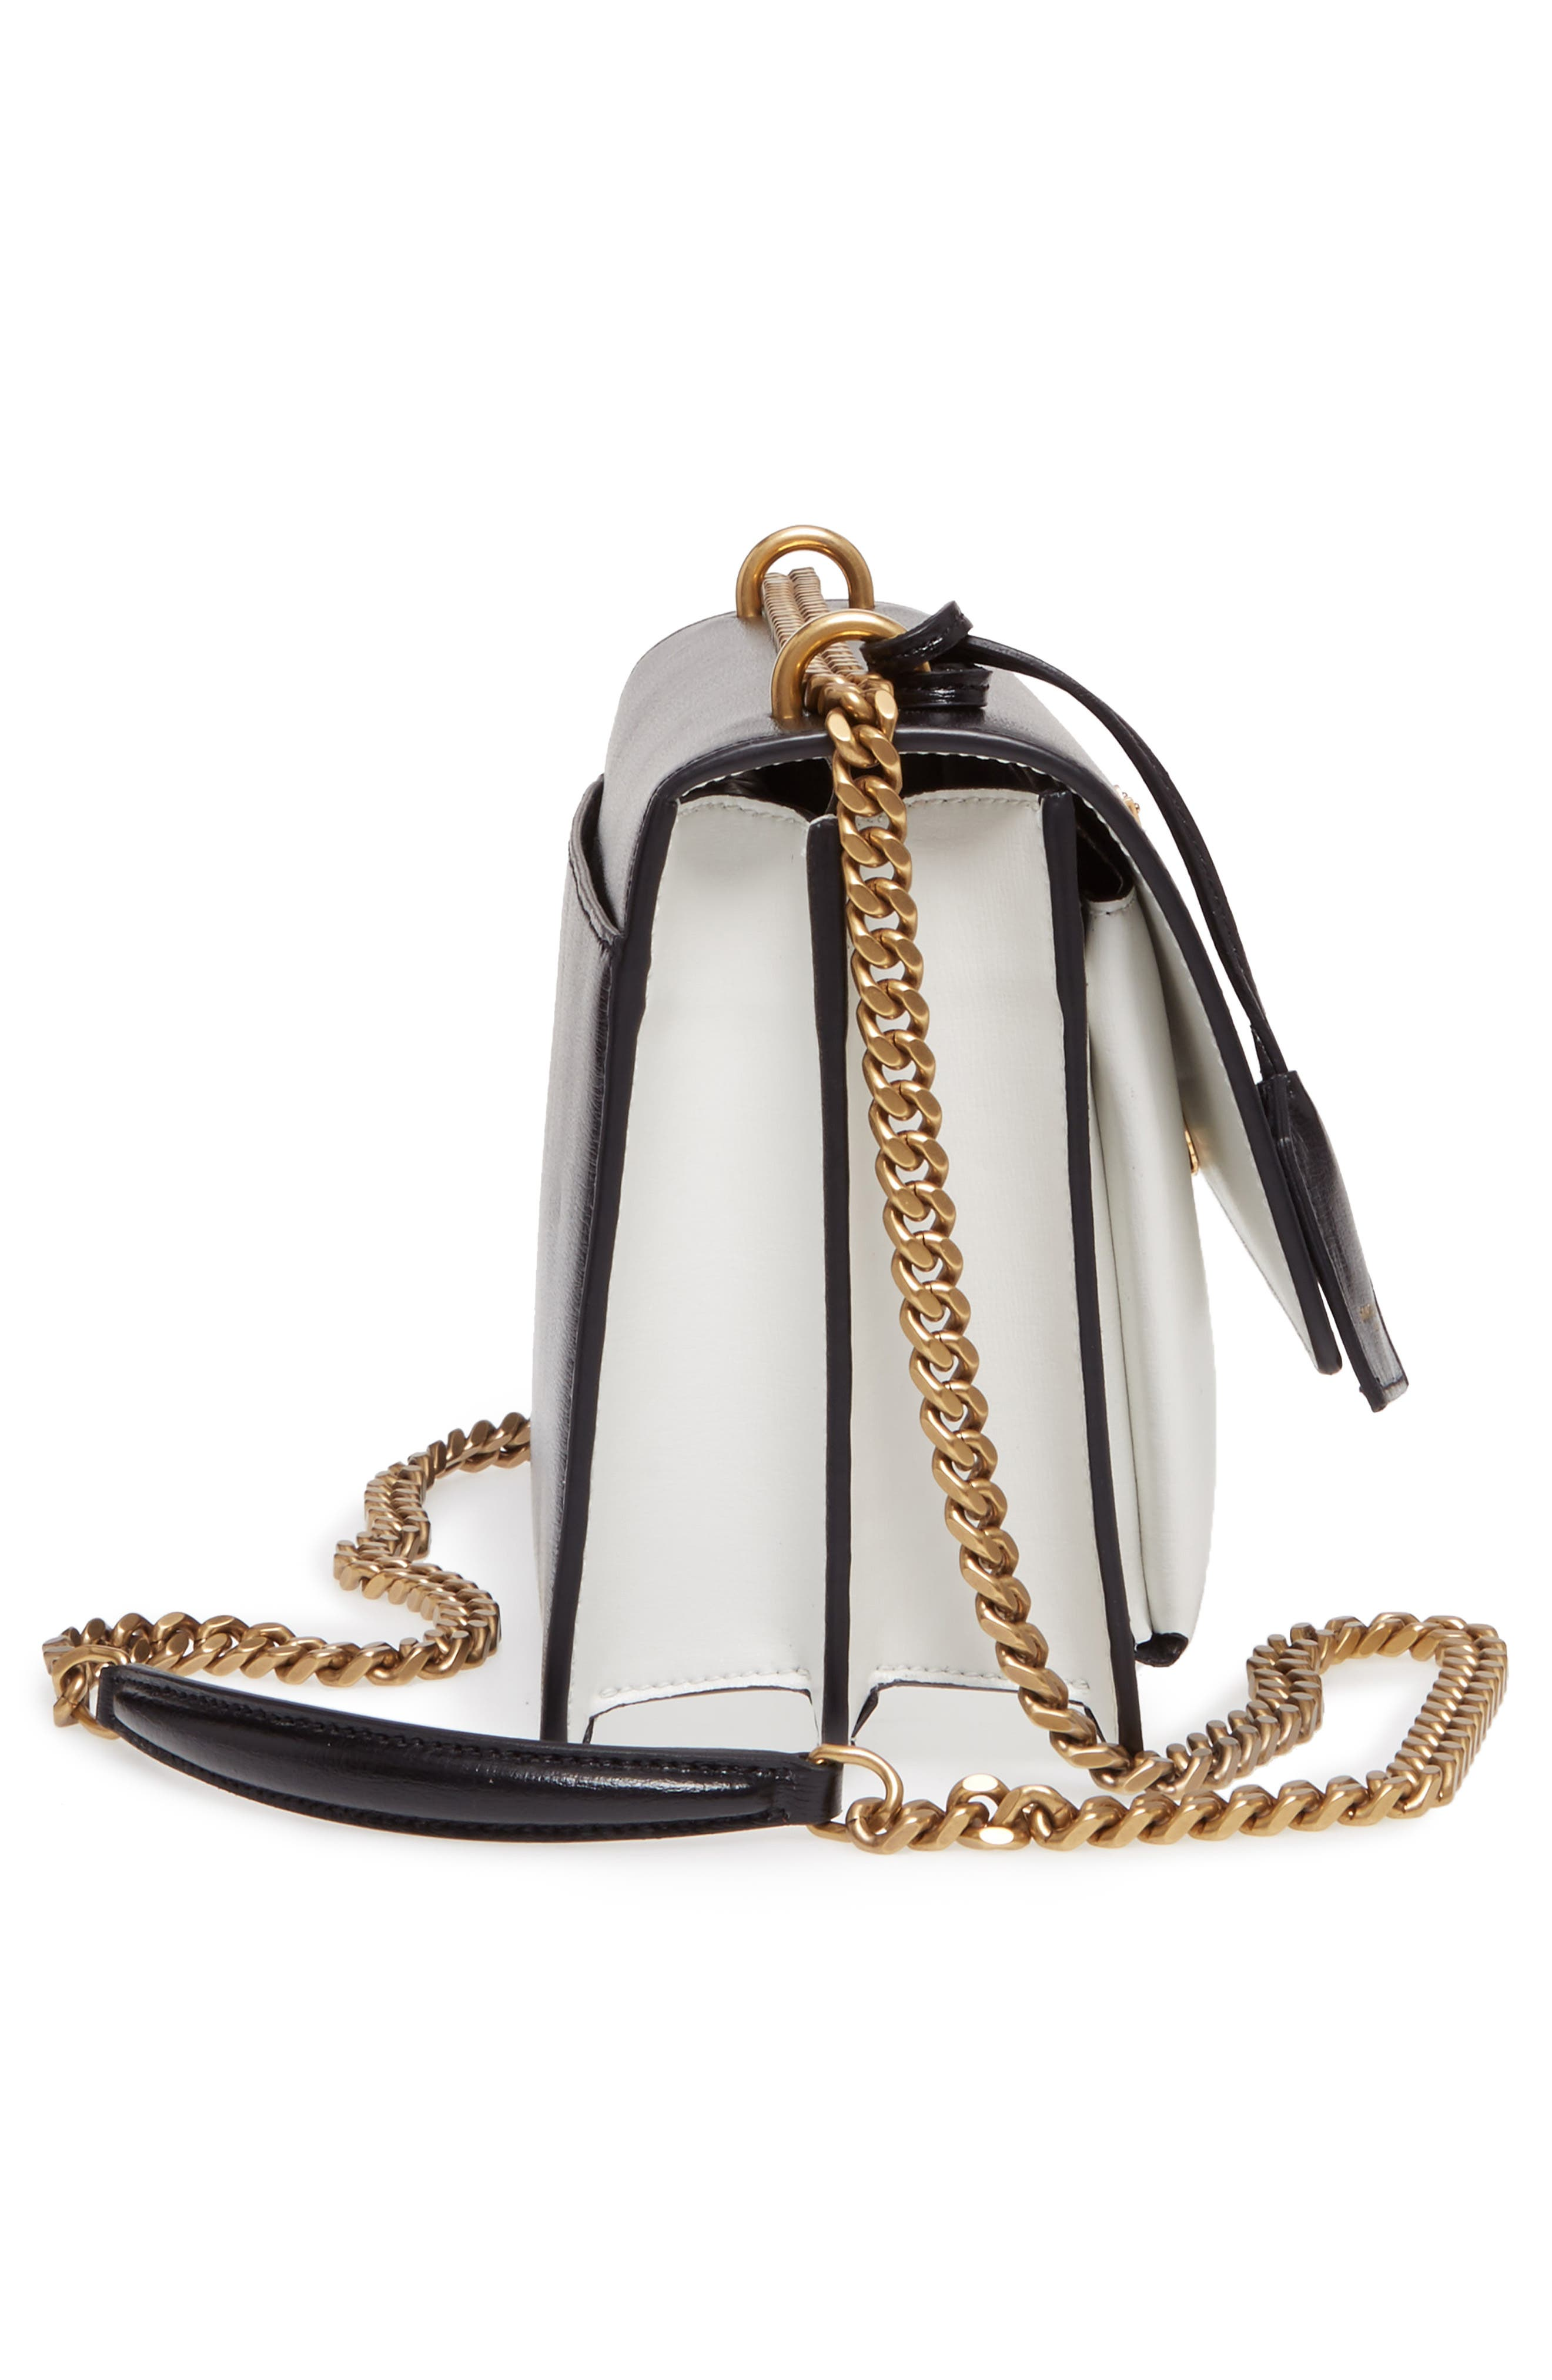 Medium Sunset Leather Shoulder Bag,                             Alternate thumbnail 4, color,                             Black/ White